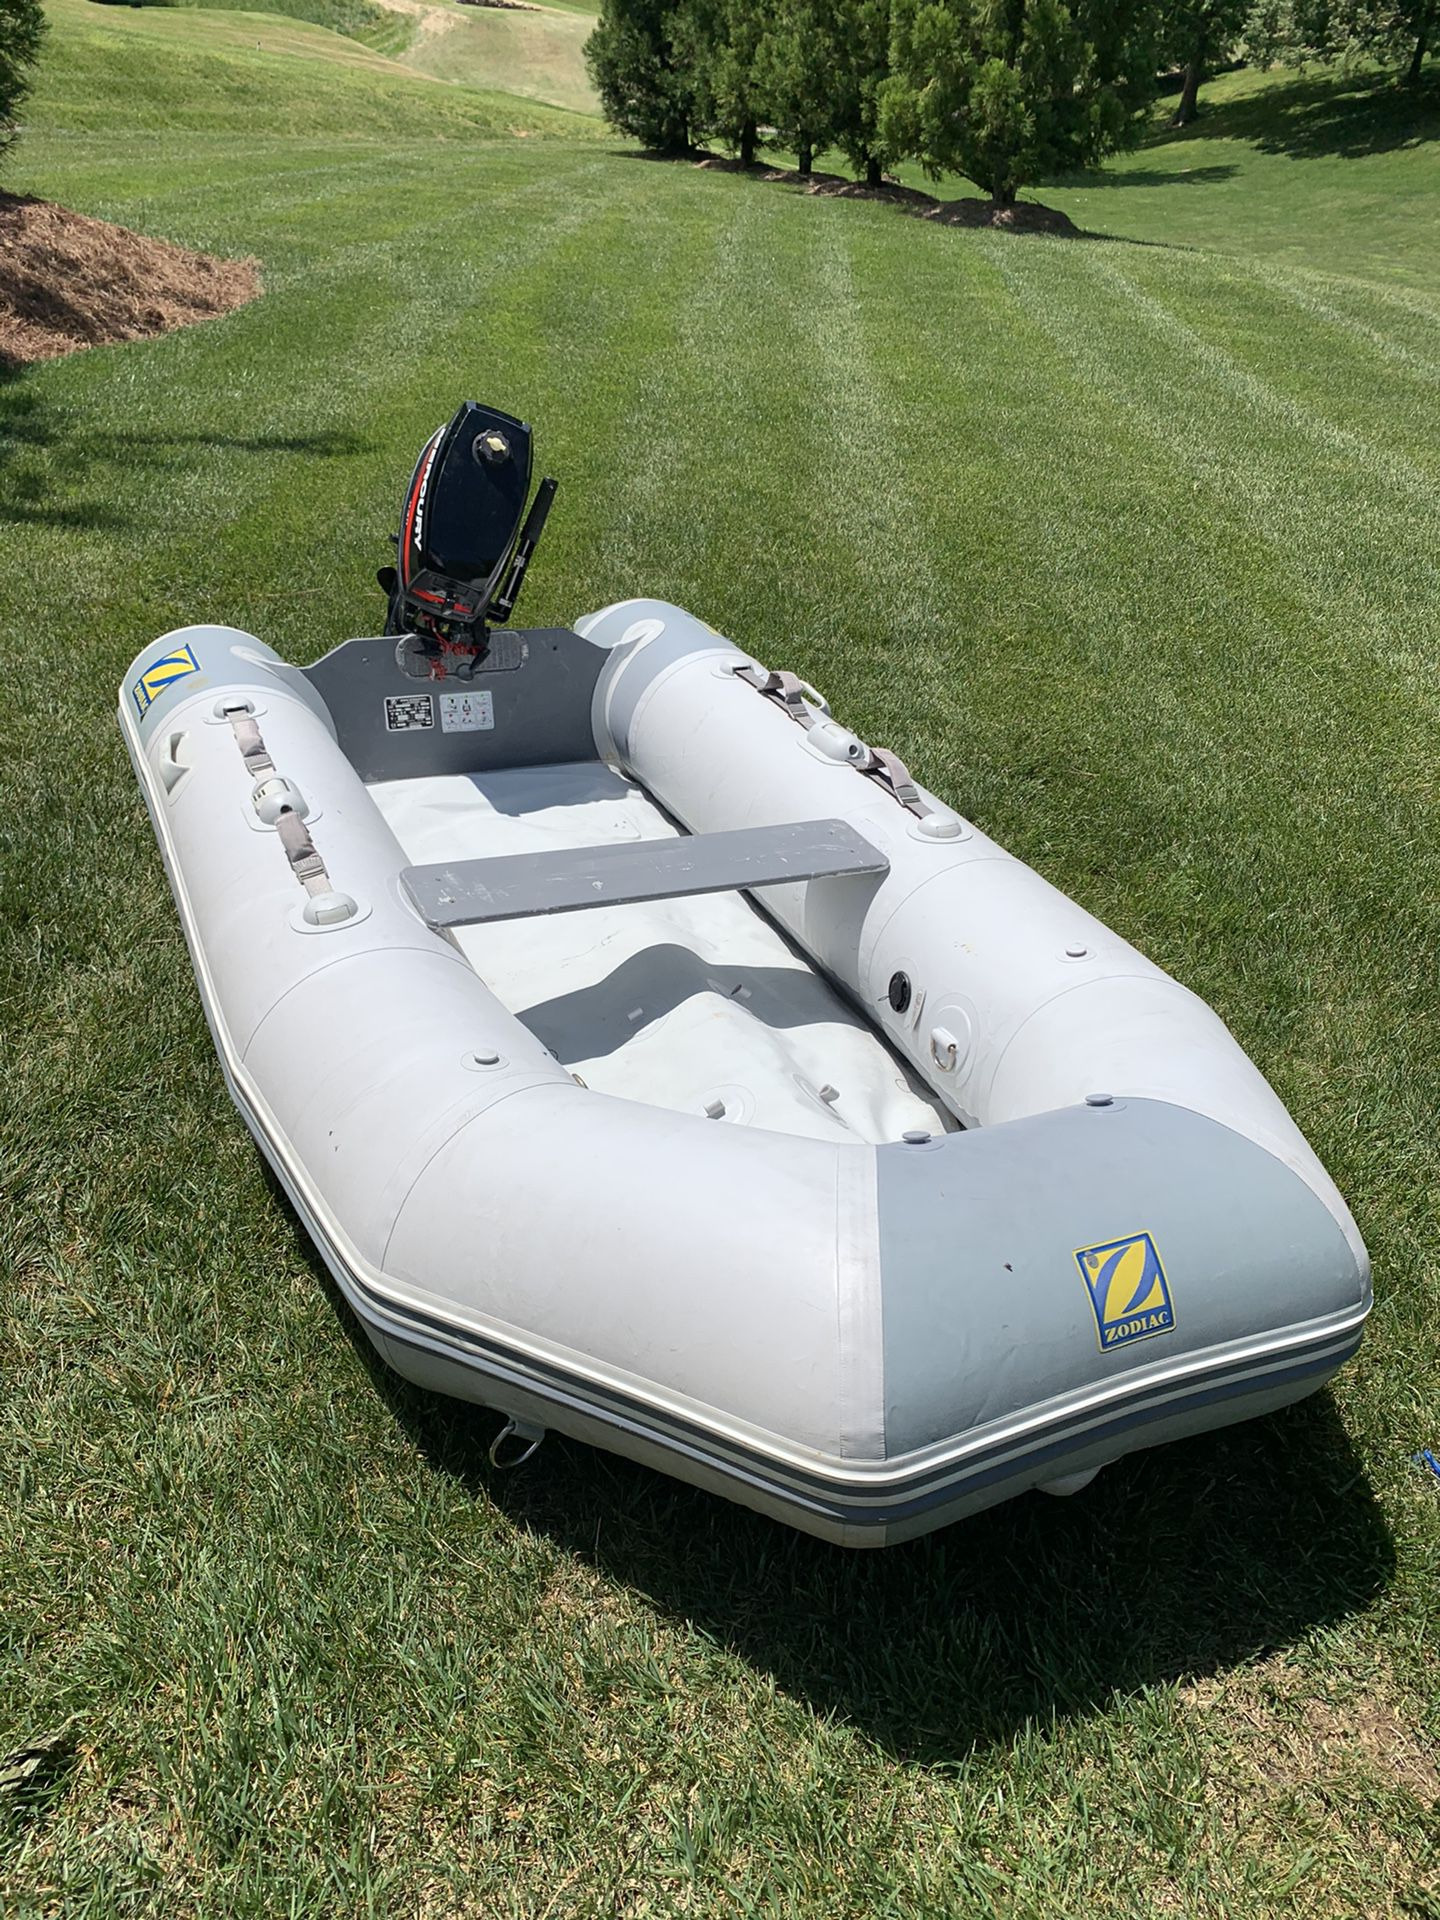 Photo 10 ft Zodiac Inflatable Boat 5 HP Mercury Engine